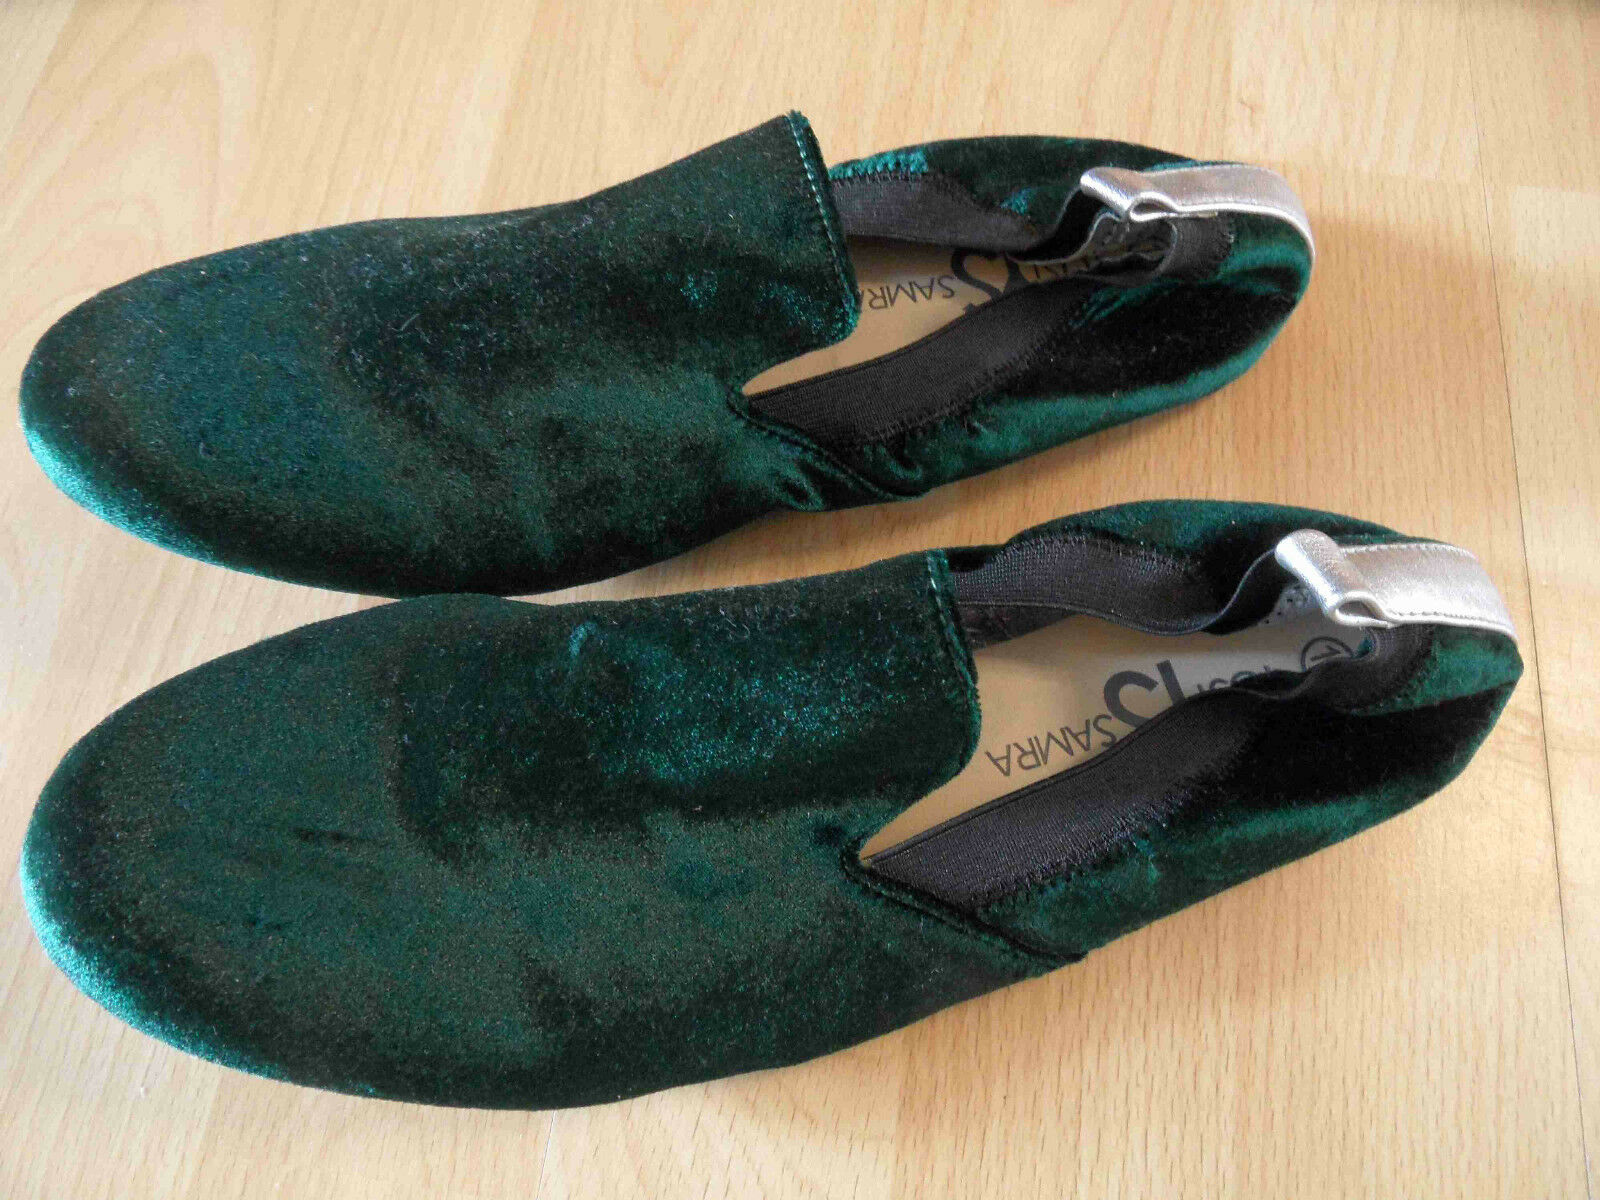 YOSI SAMRA tolle Loafer  Samt grün Gr. 40  Loafer NEU BSu316 408cae